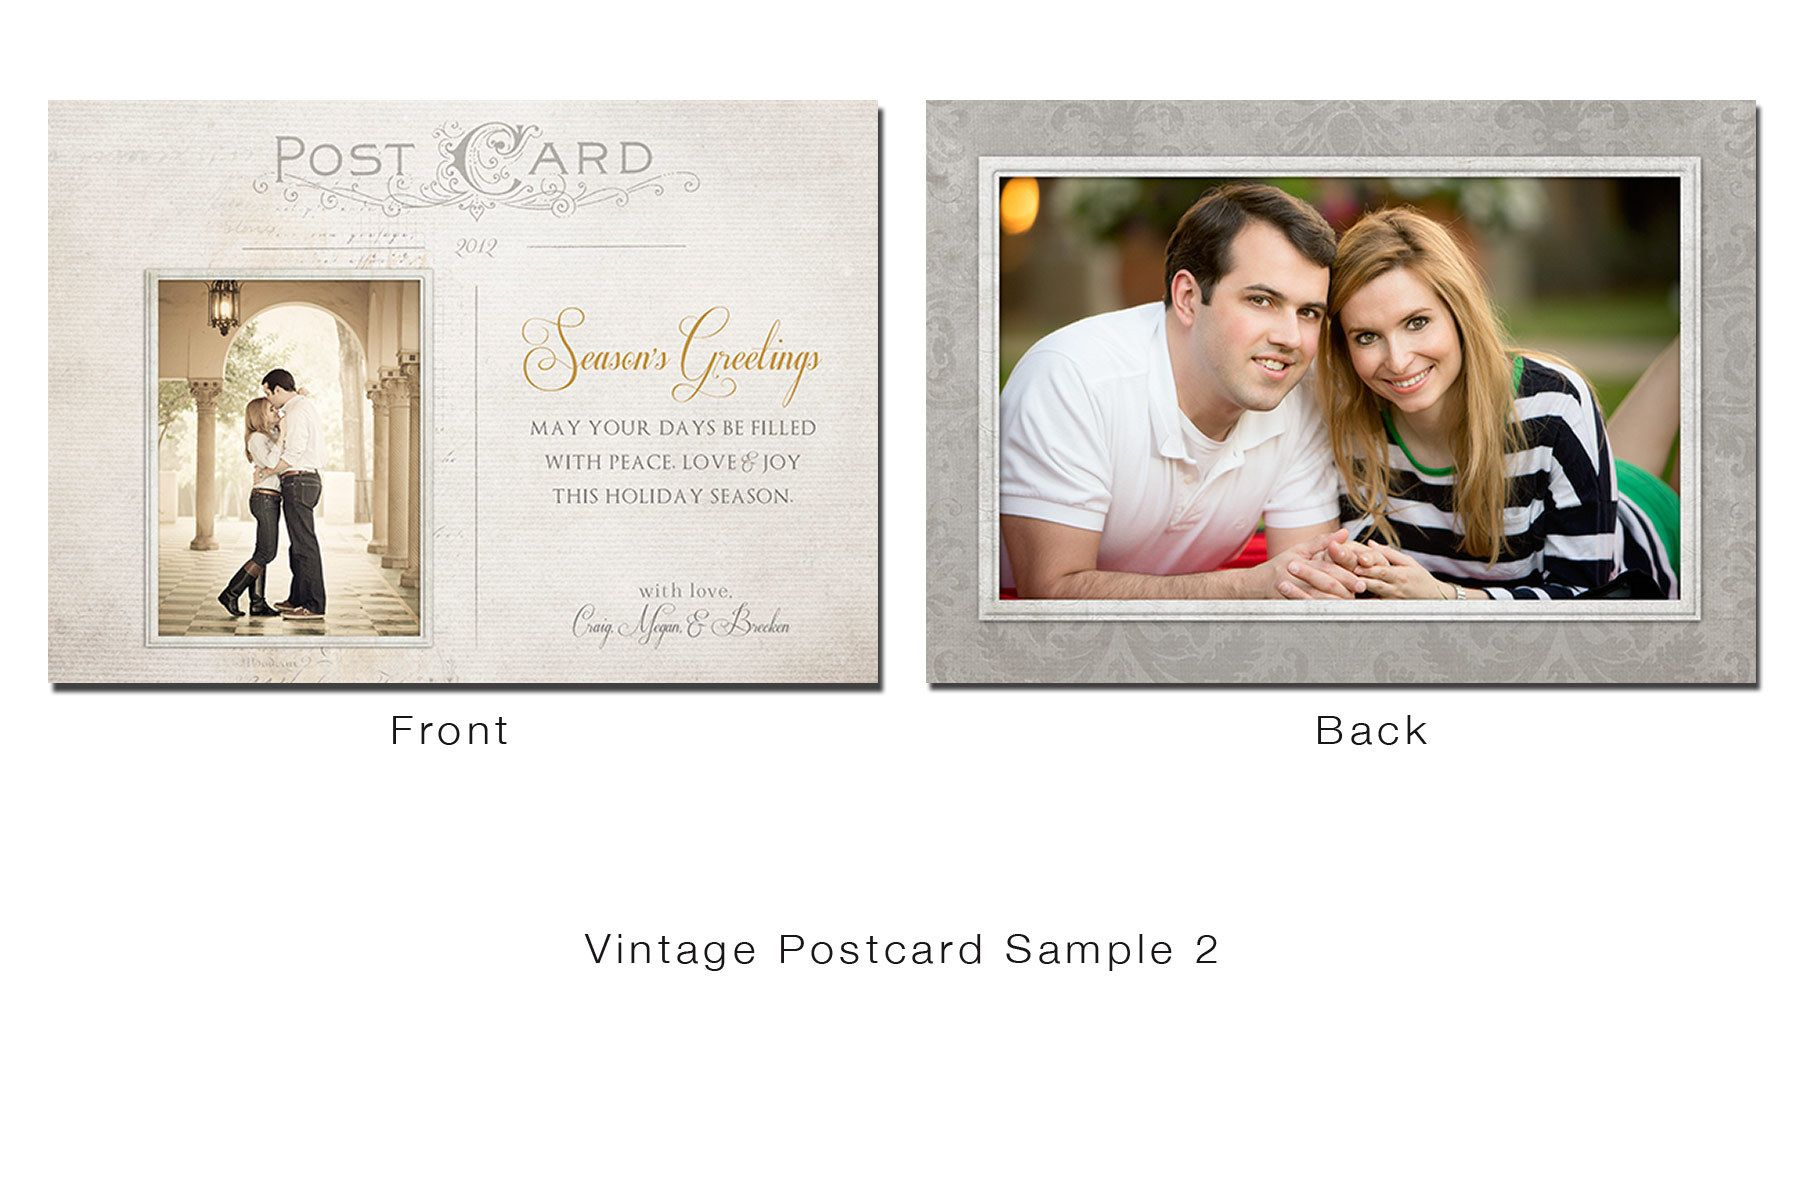 1vintage_postcard_sample_2.jpg